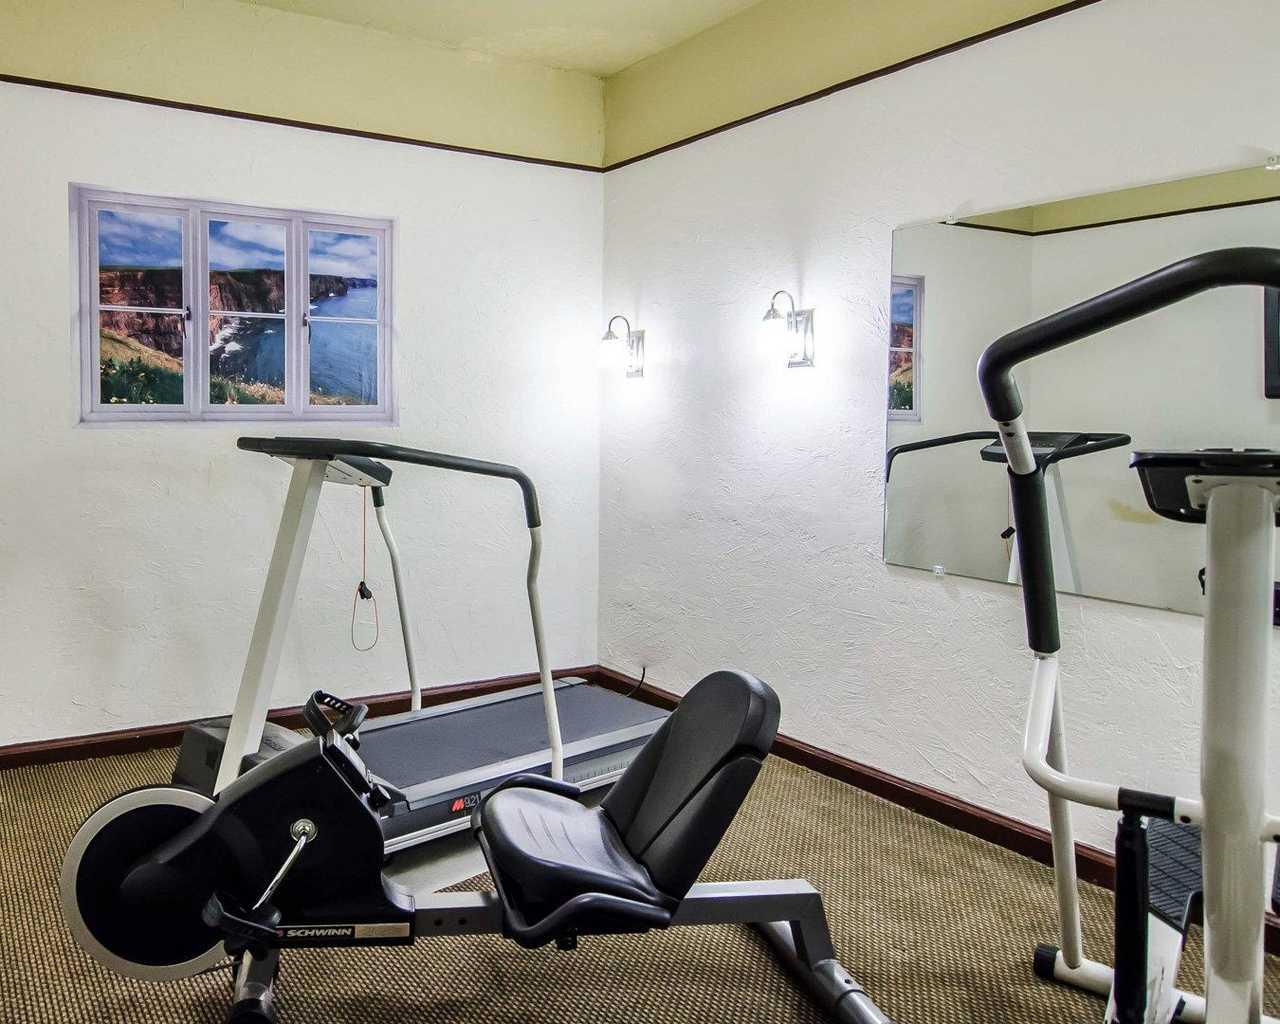 seville - FitnessRoom1